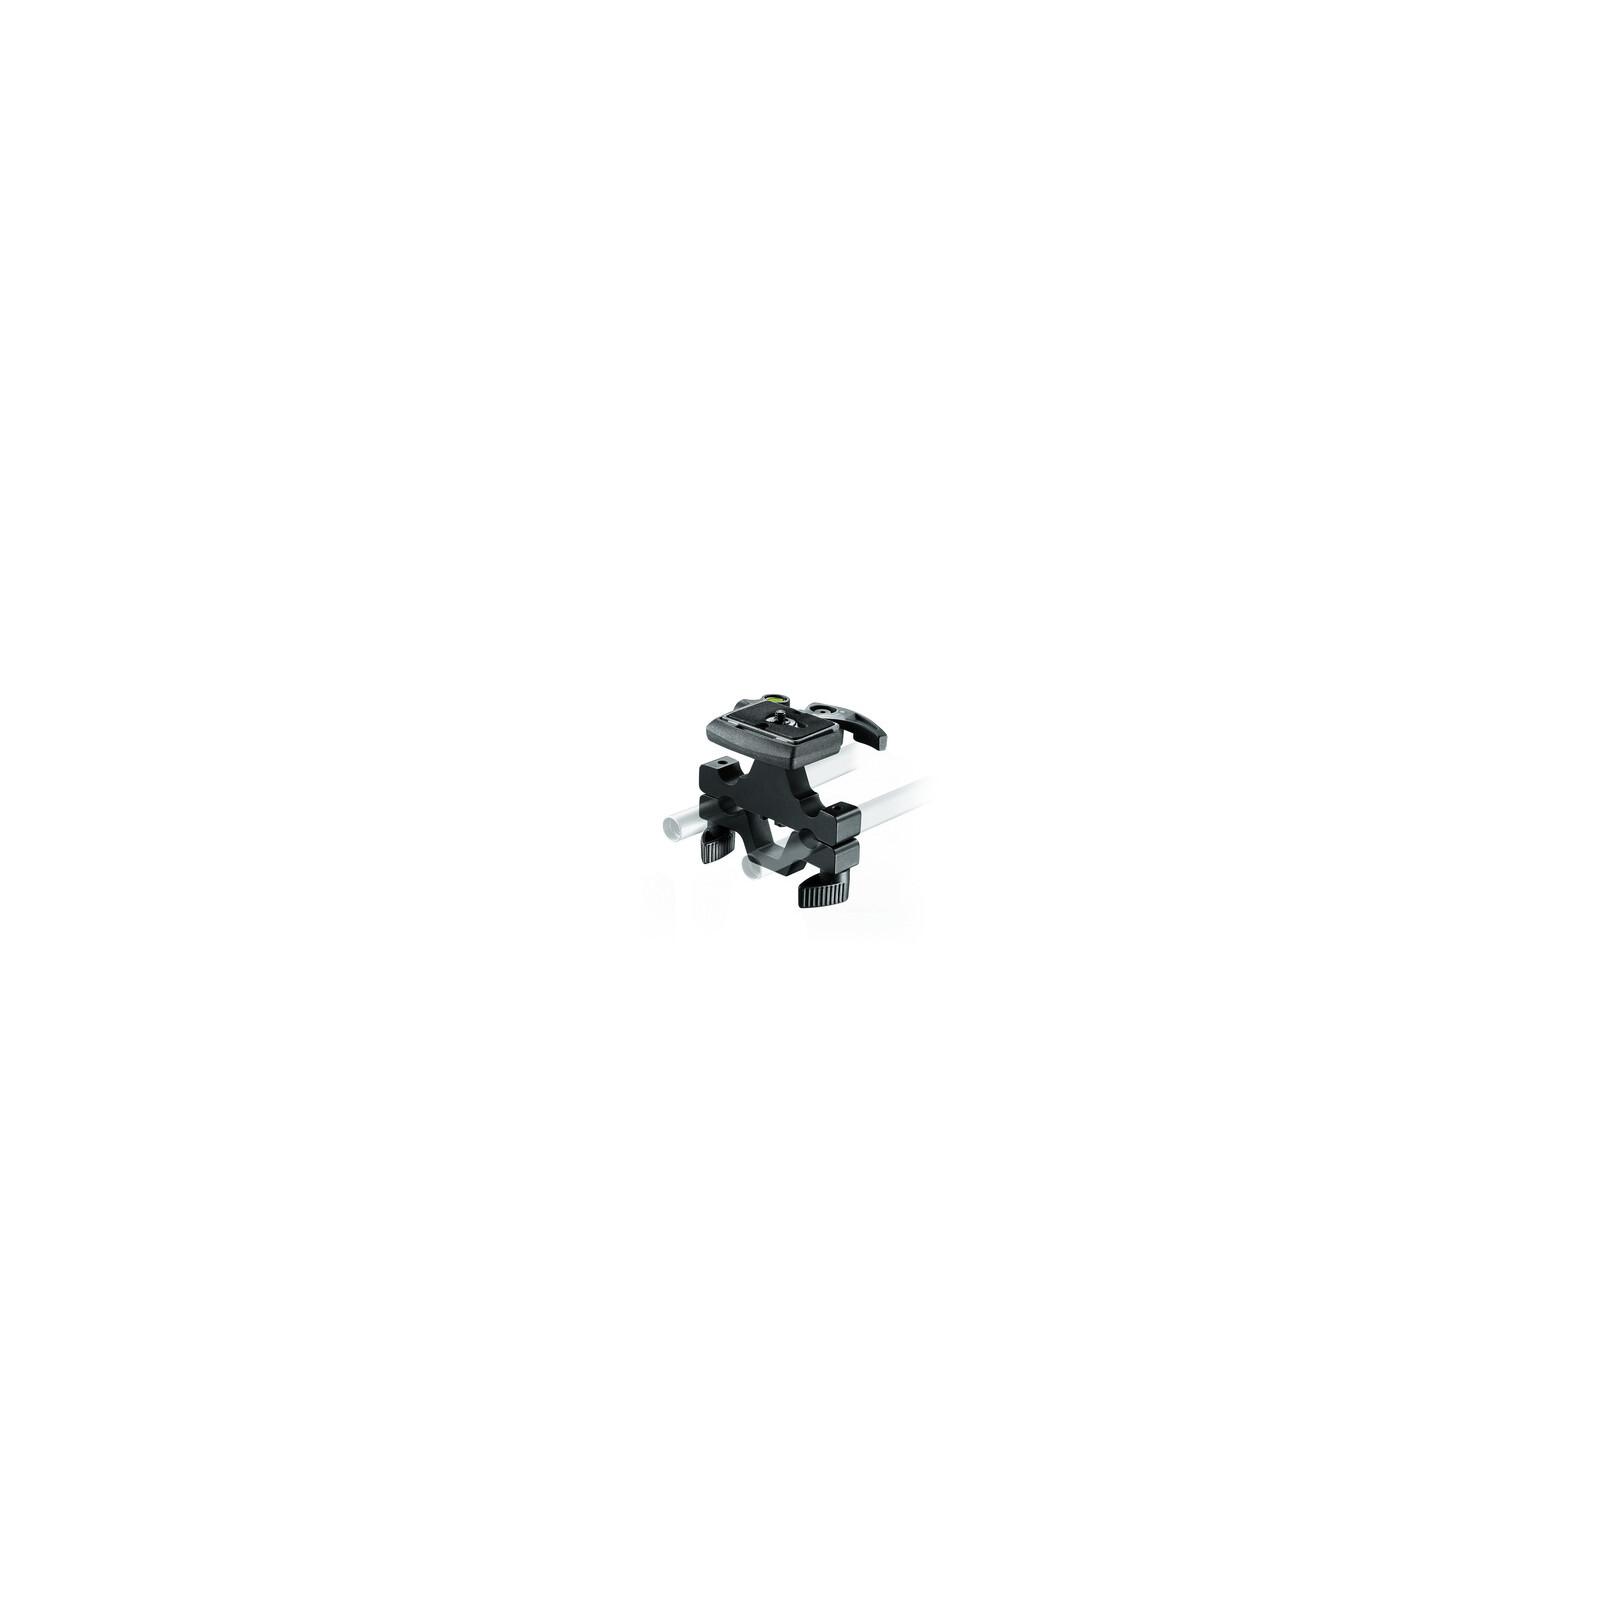 Manfrotto Sympla RC2 Grundplatte